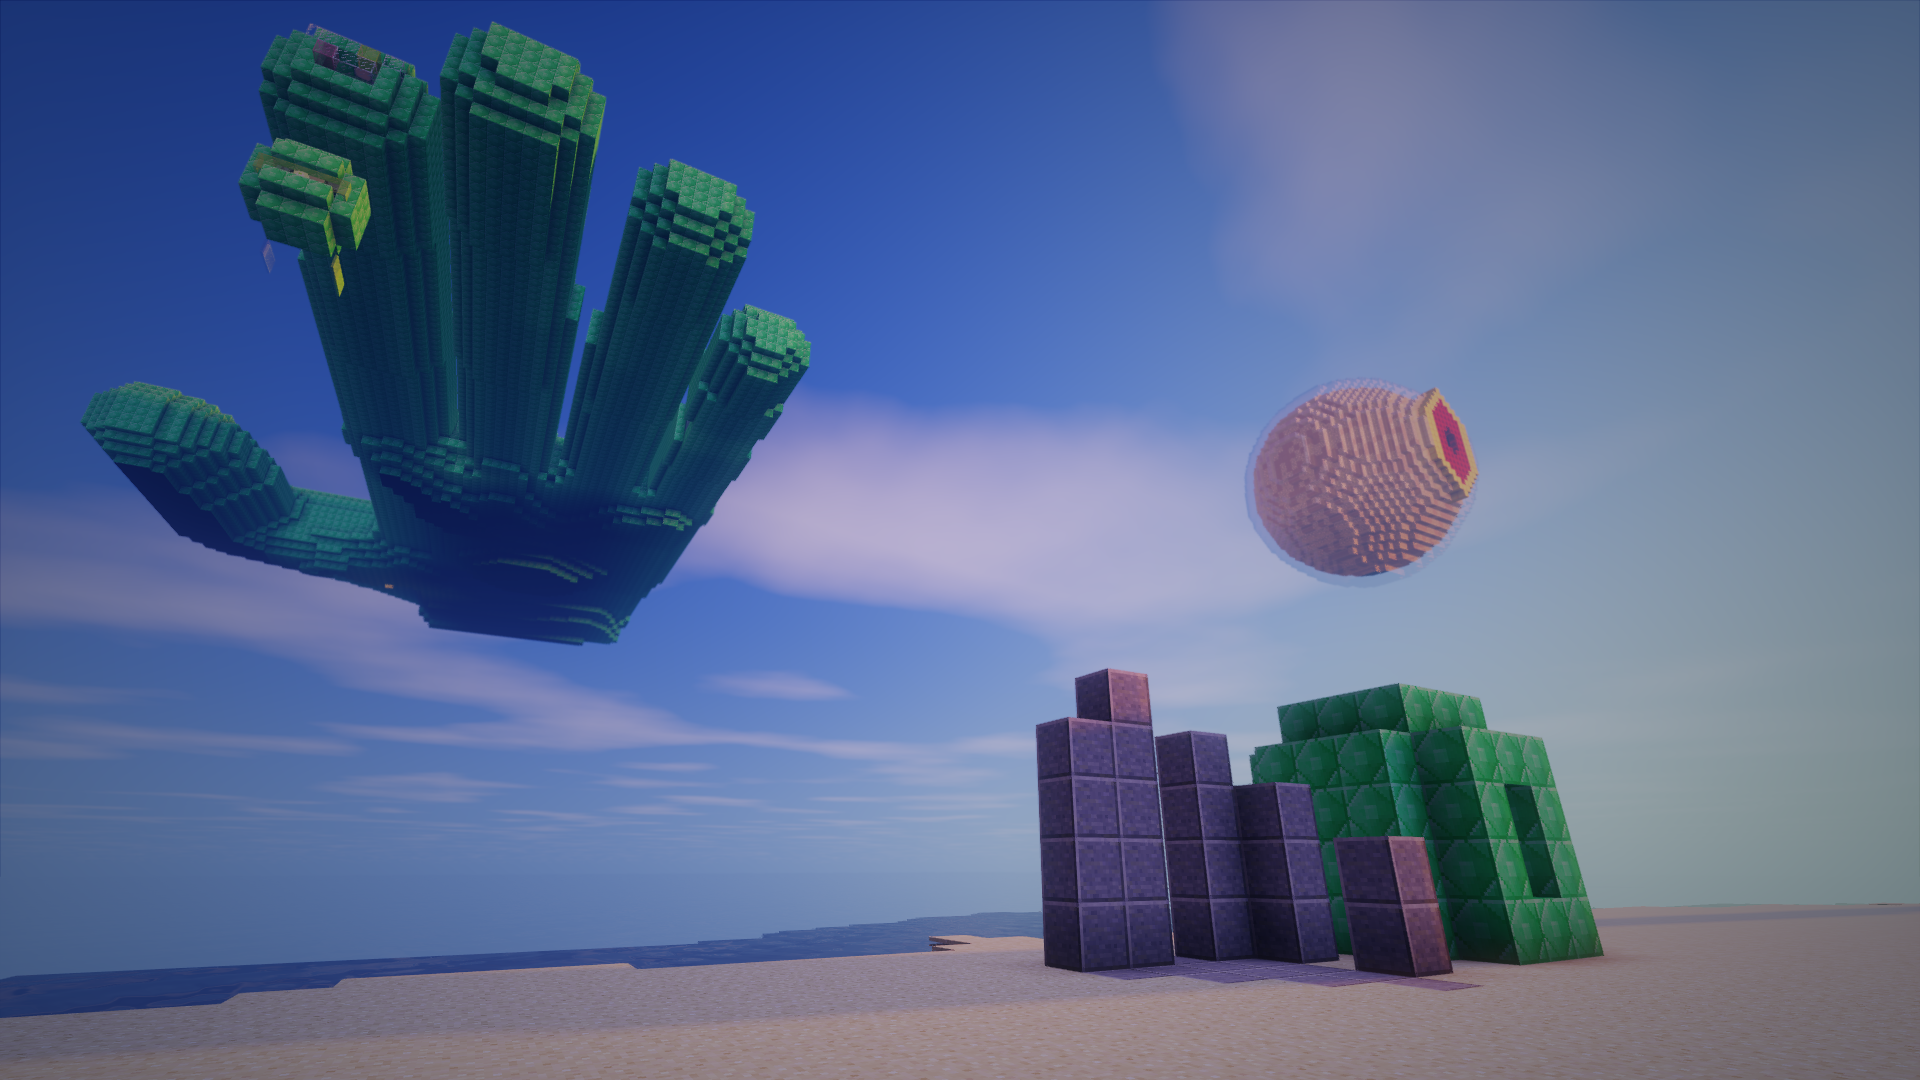 Good Wallpaper Minecraft Universe - latest?cb\u003d20160120034433  Best Photo Reference_246977.png/revision/latest?cb\u003d20160120034433